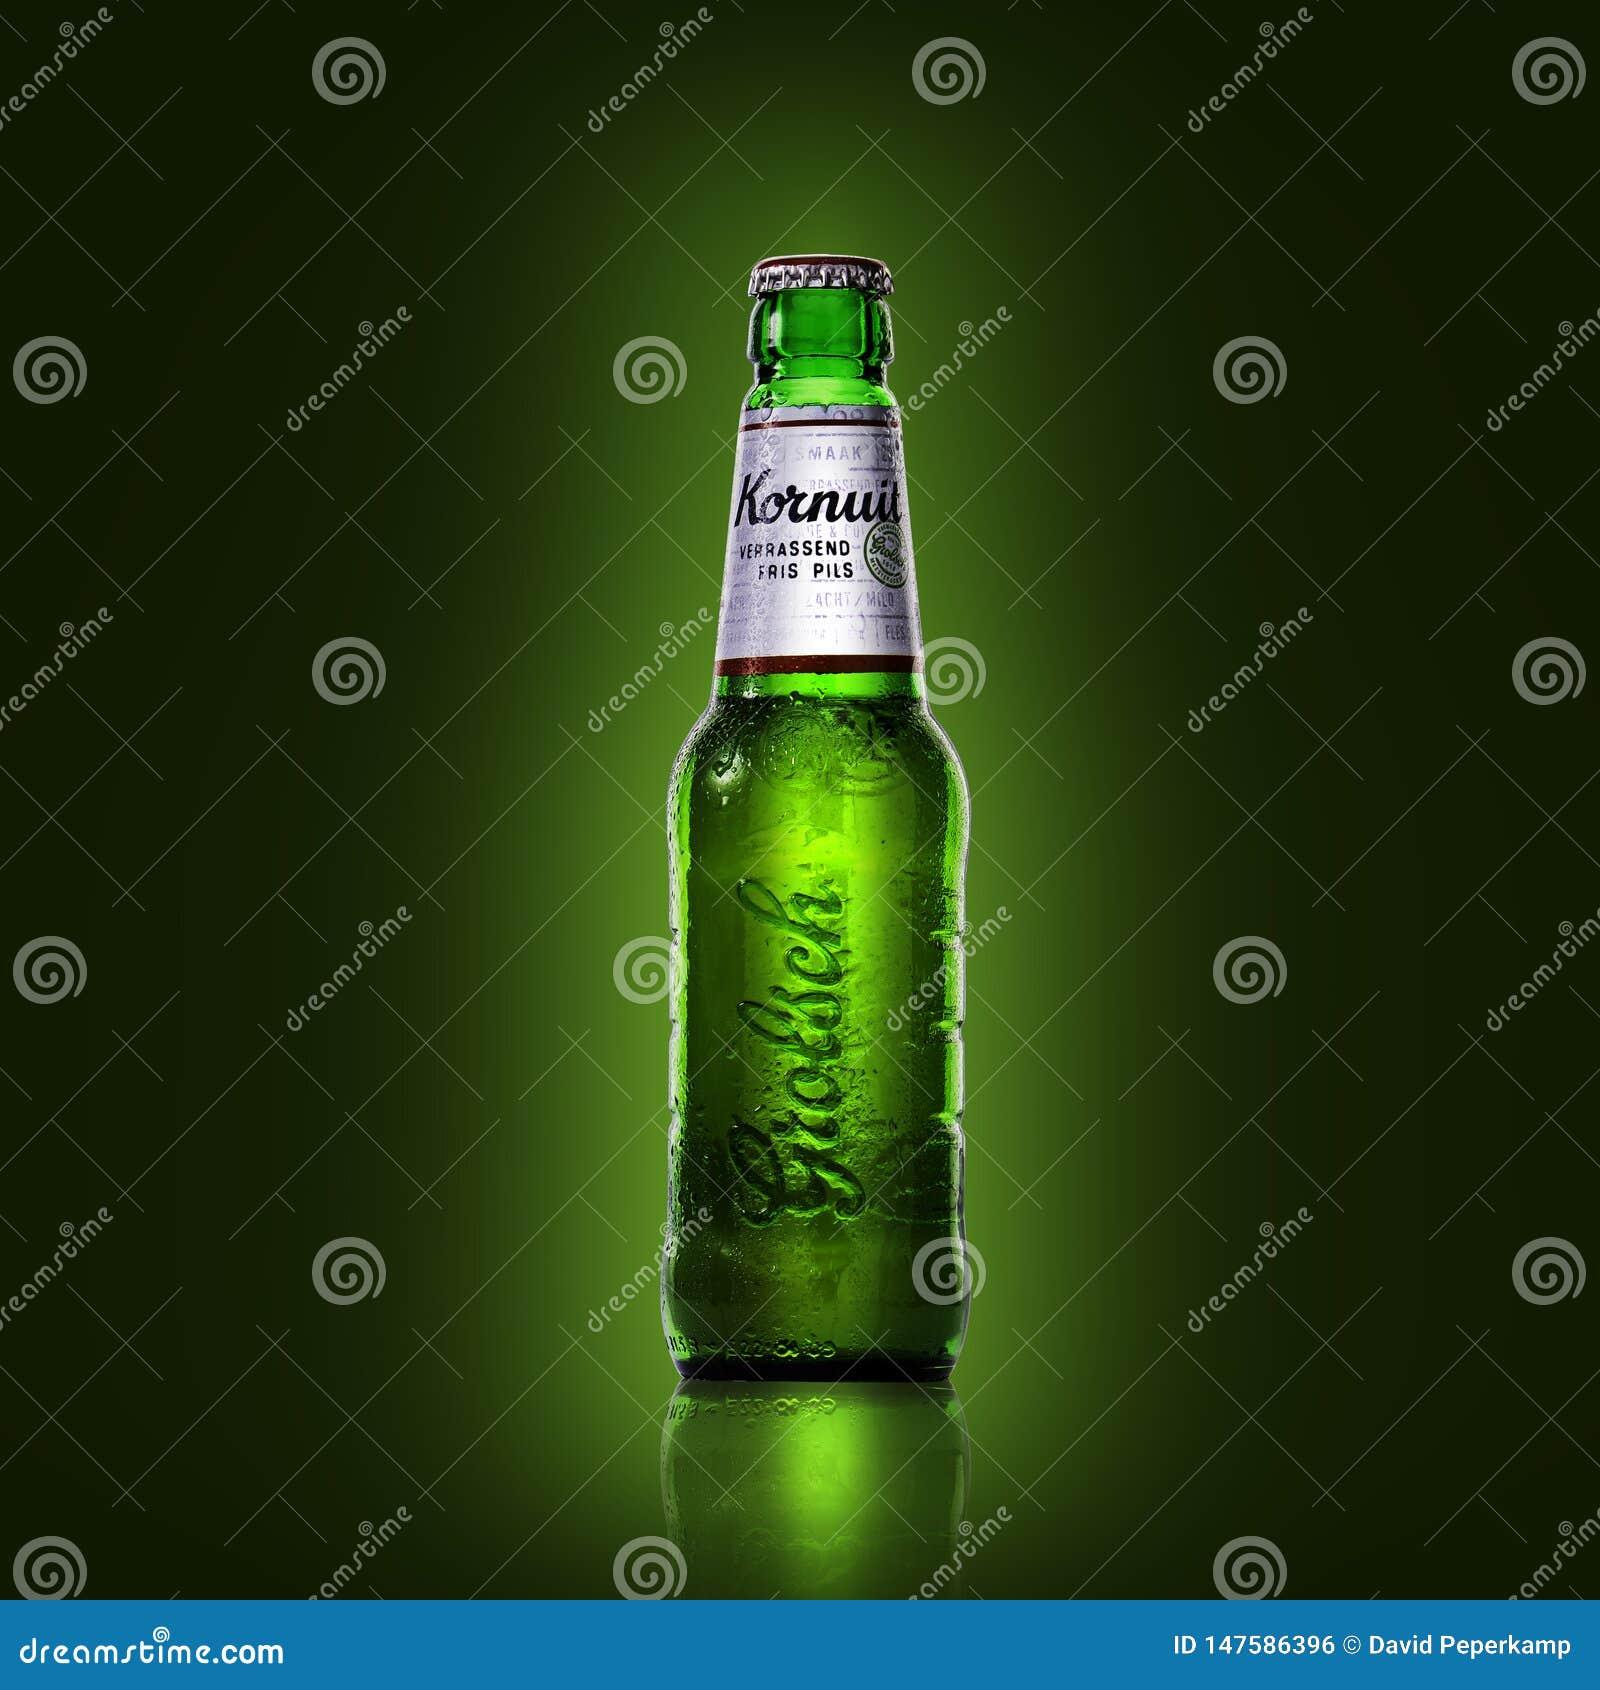 Grolsch Beer bottle on a green background,